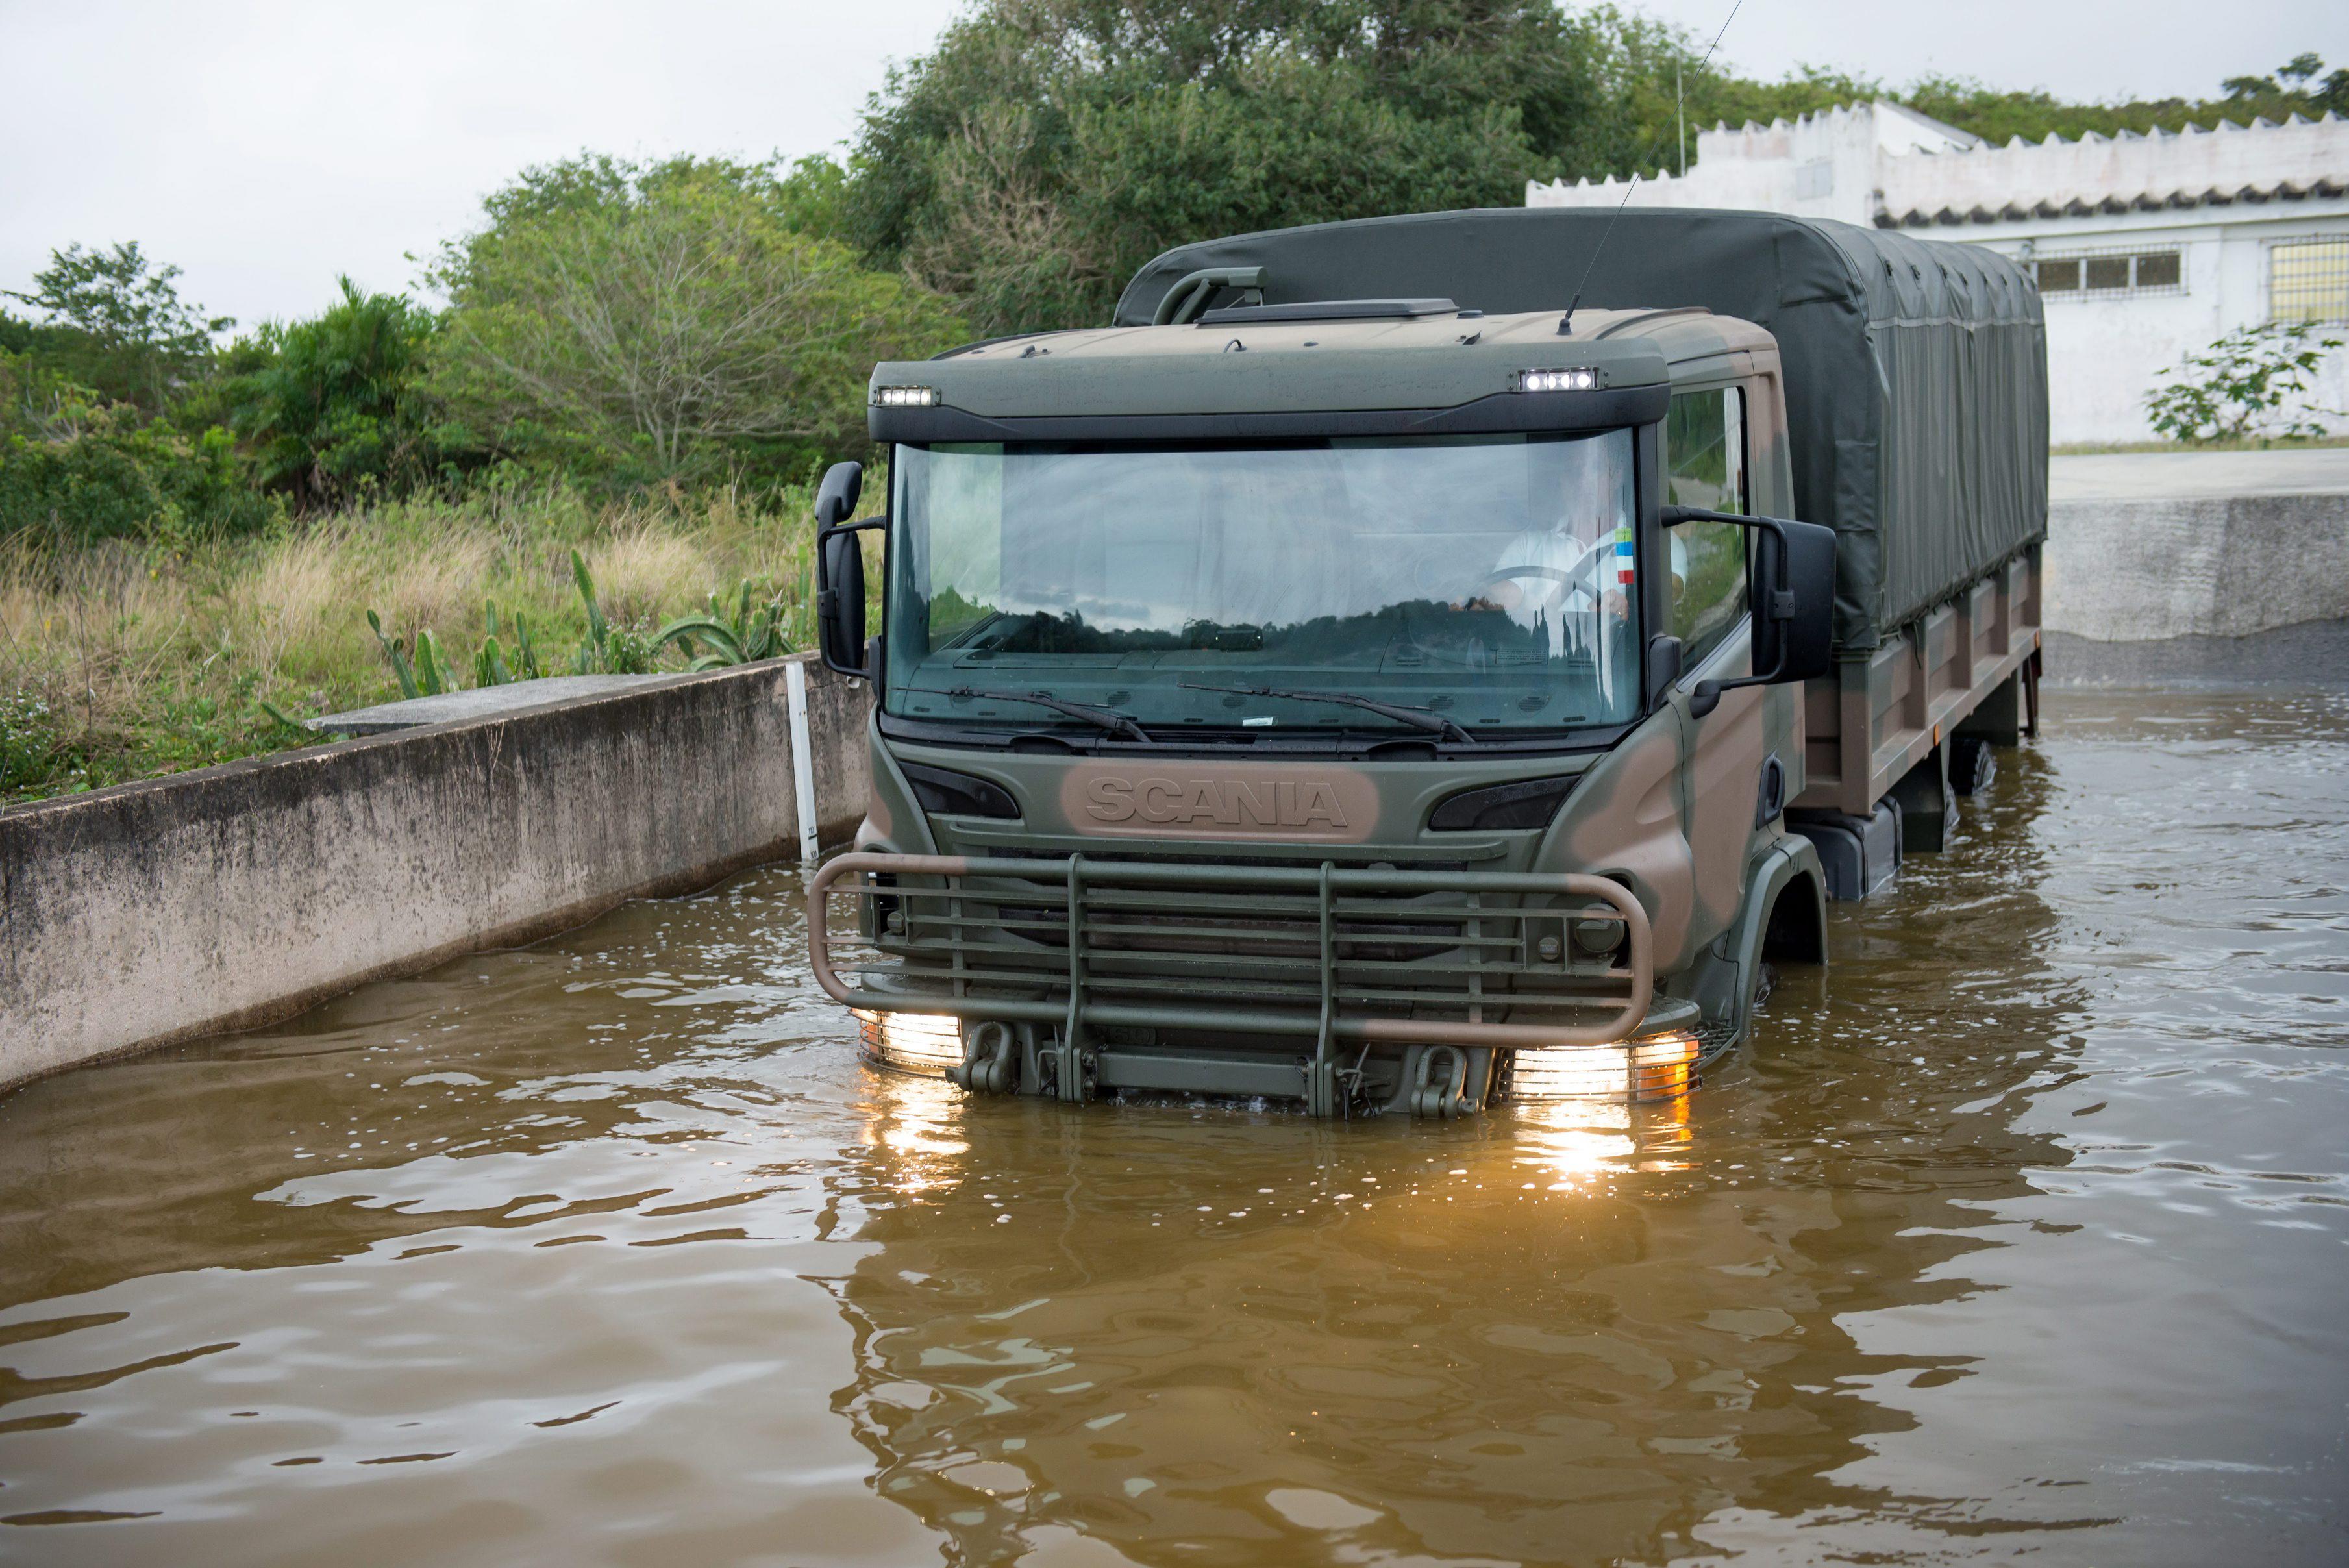 Scania P 360 6x6 /Foto Wagner Menezes